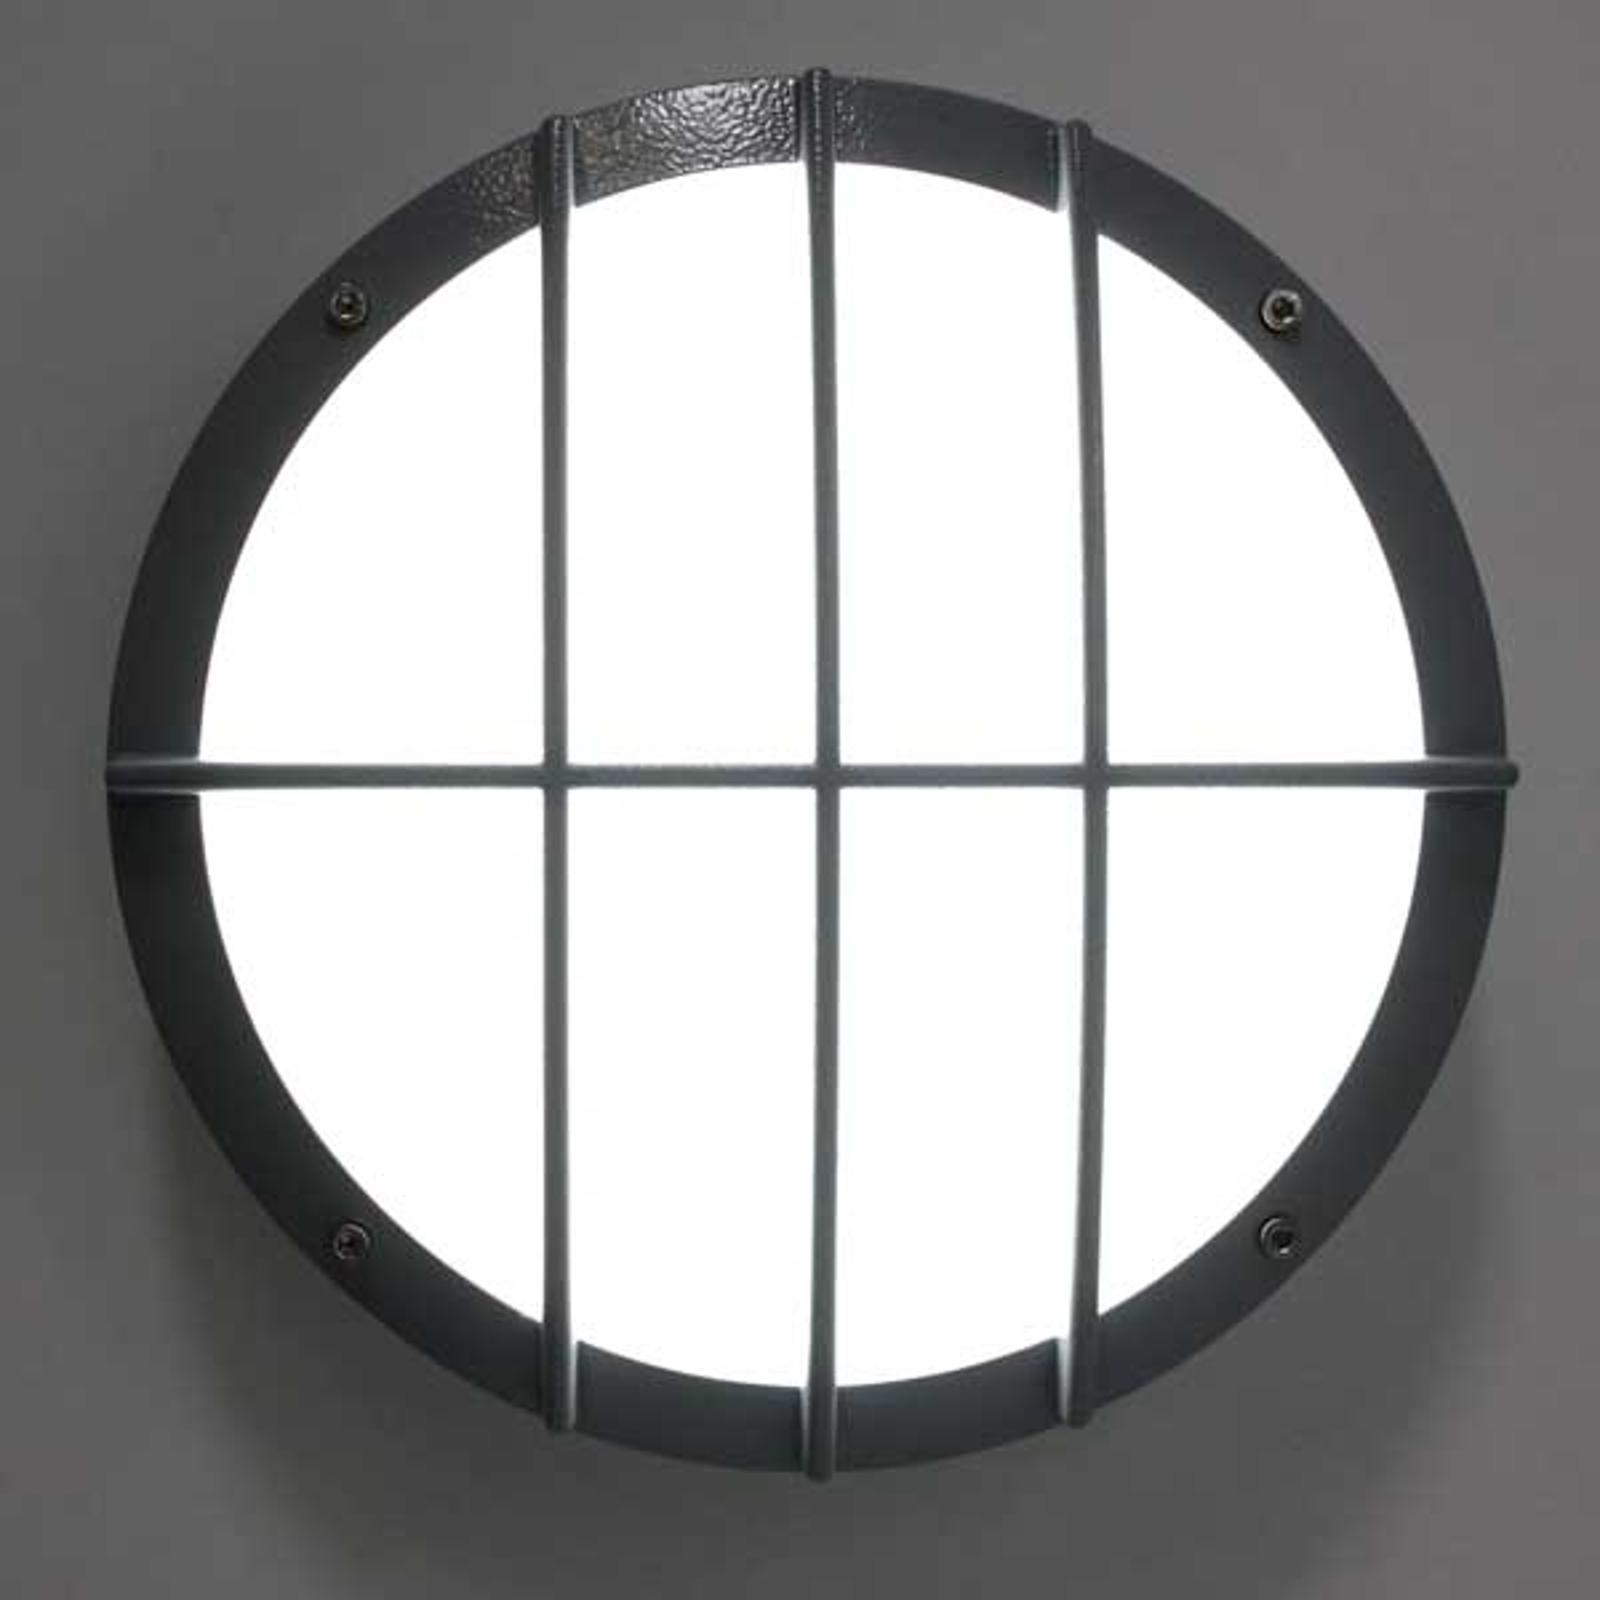 LED-Wandleuchte Sun 8 LED Sensor, 3.000K